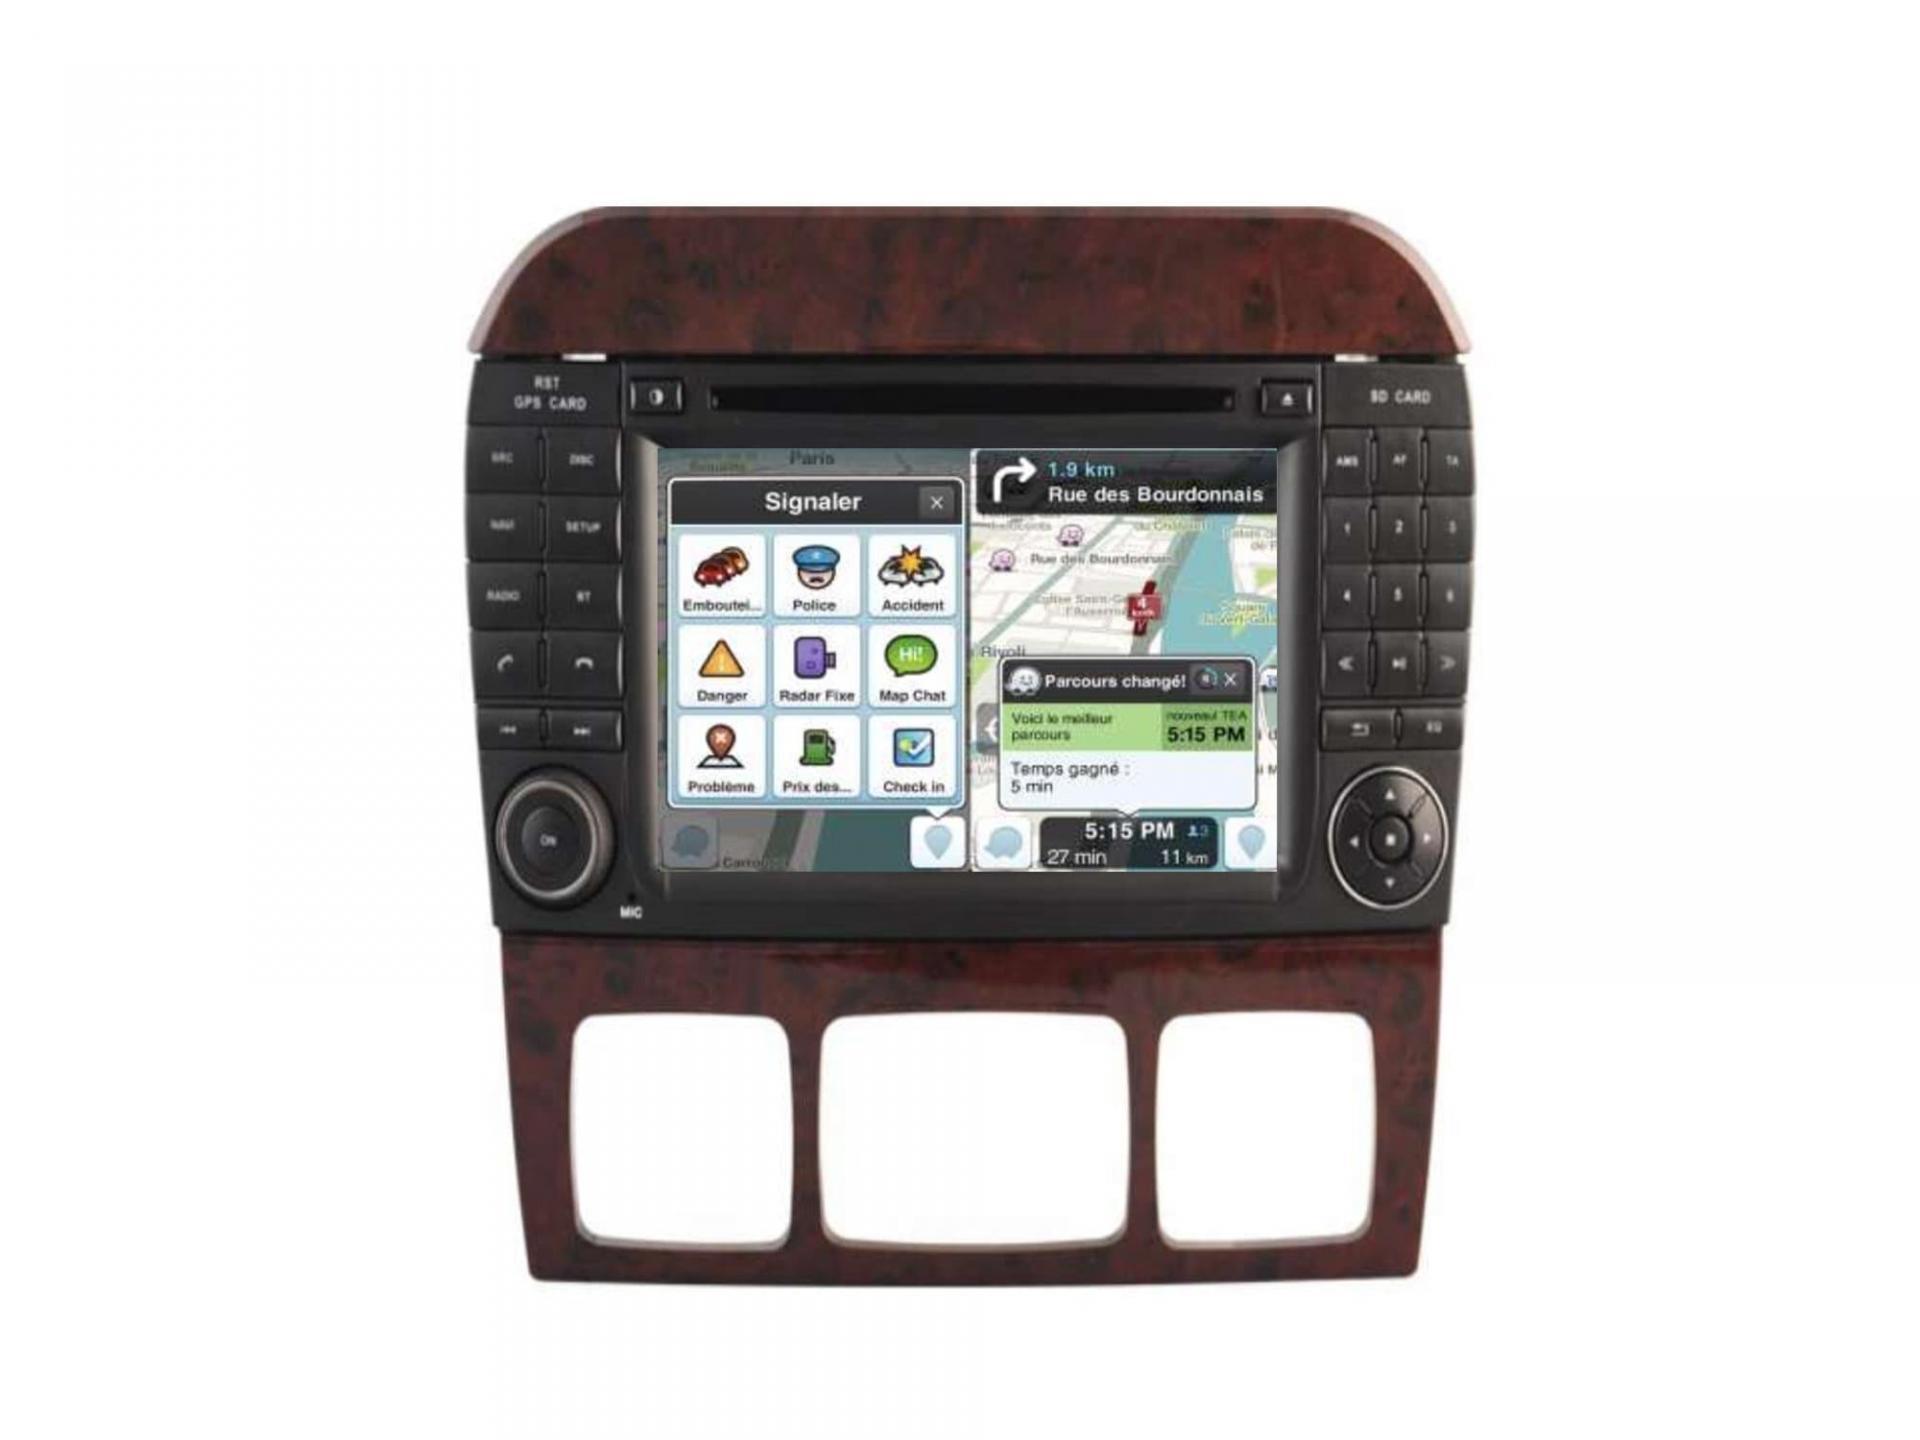 Autoradio gps carplay android auto gps bluetooth mercedes classe s w220 classe cl w215 1